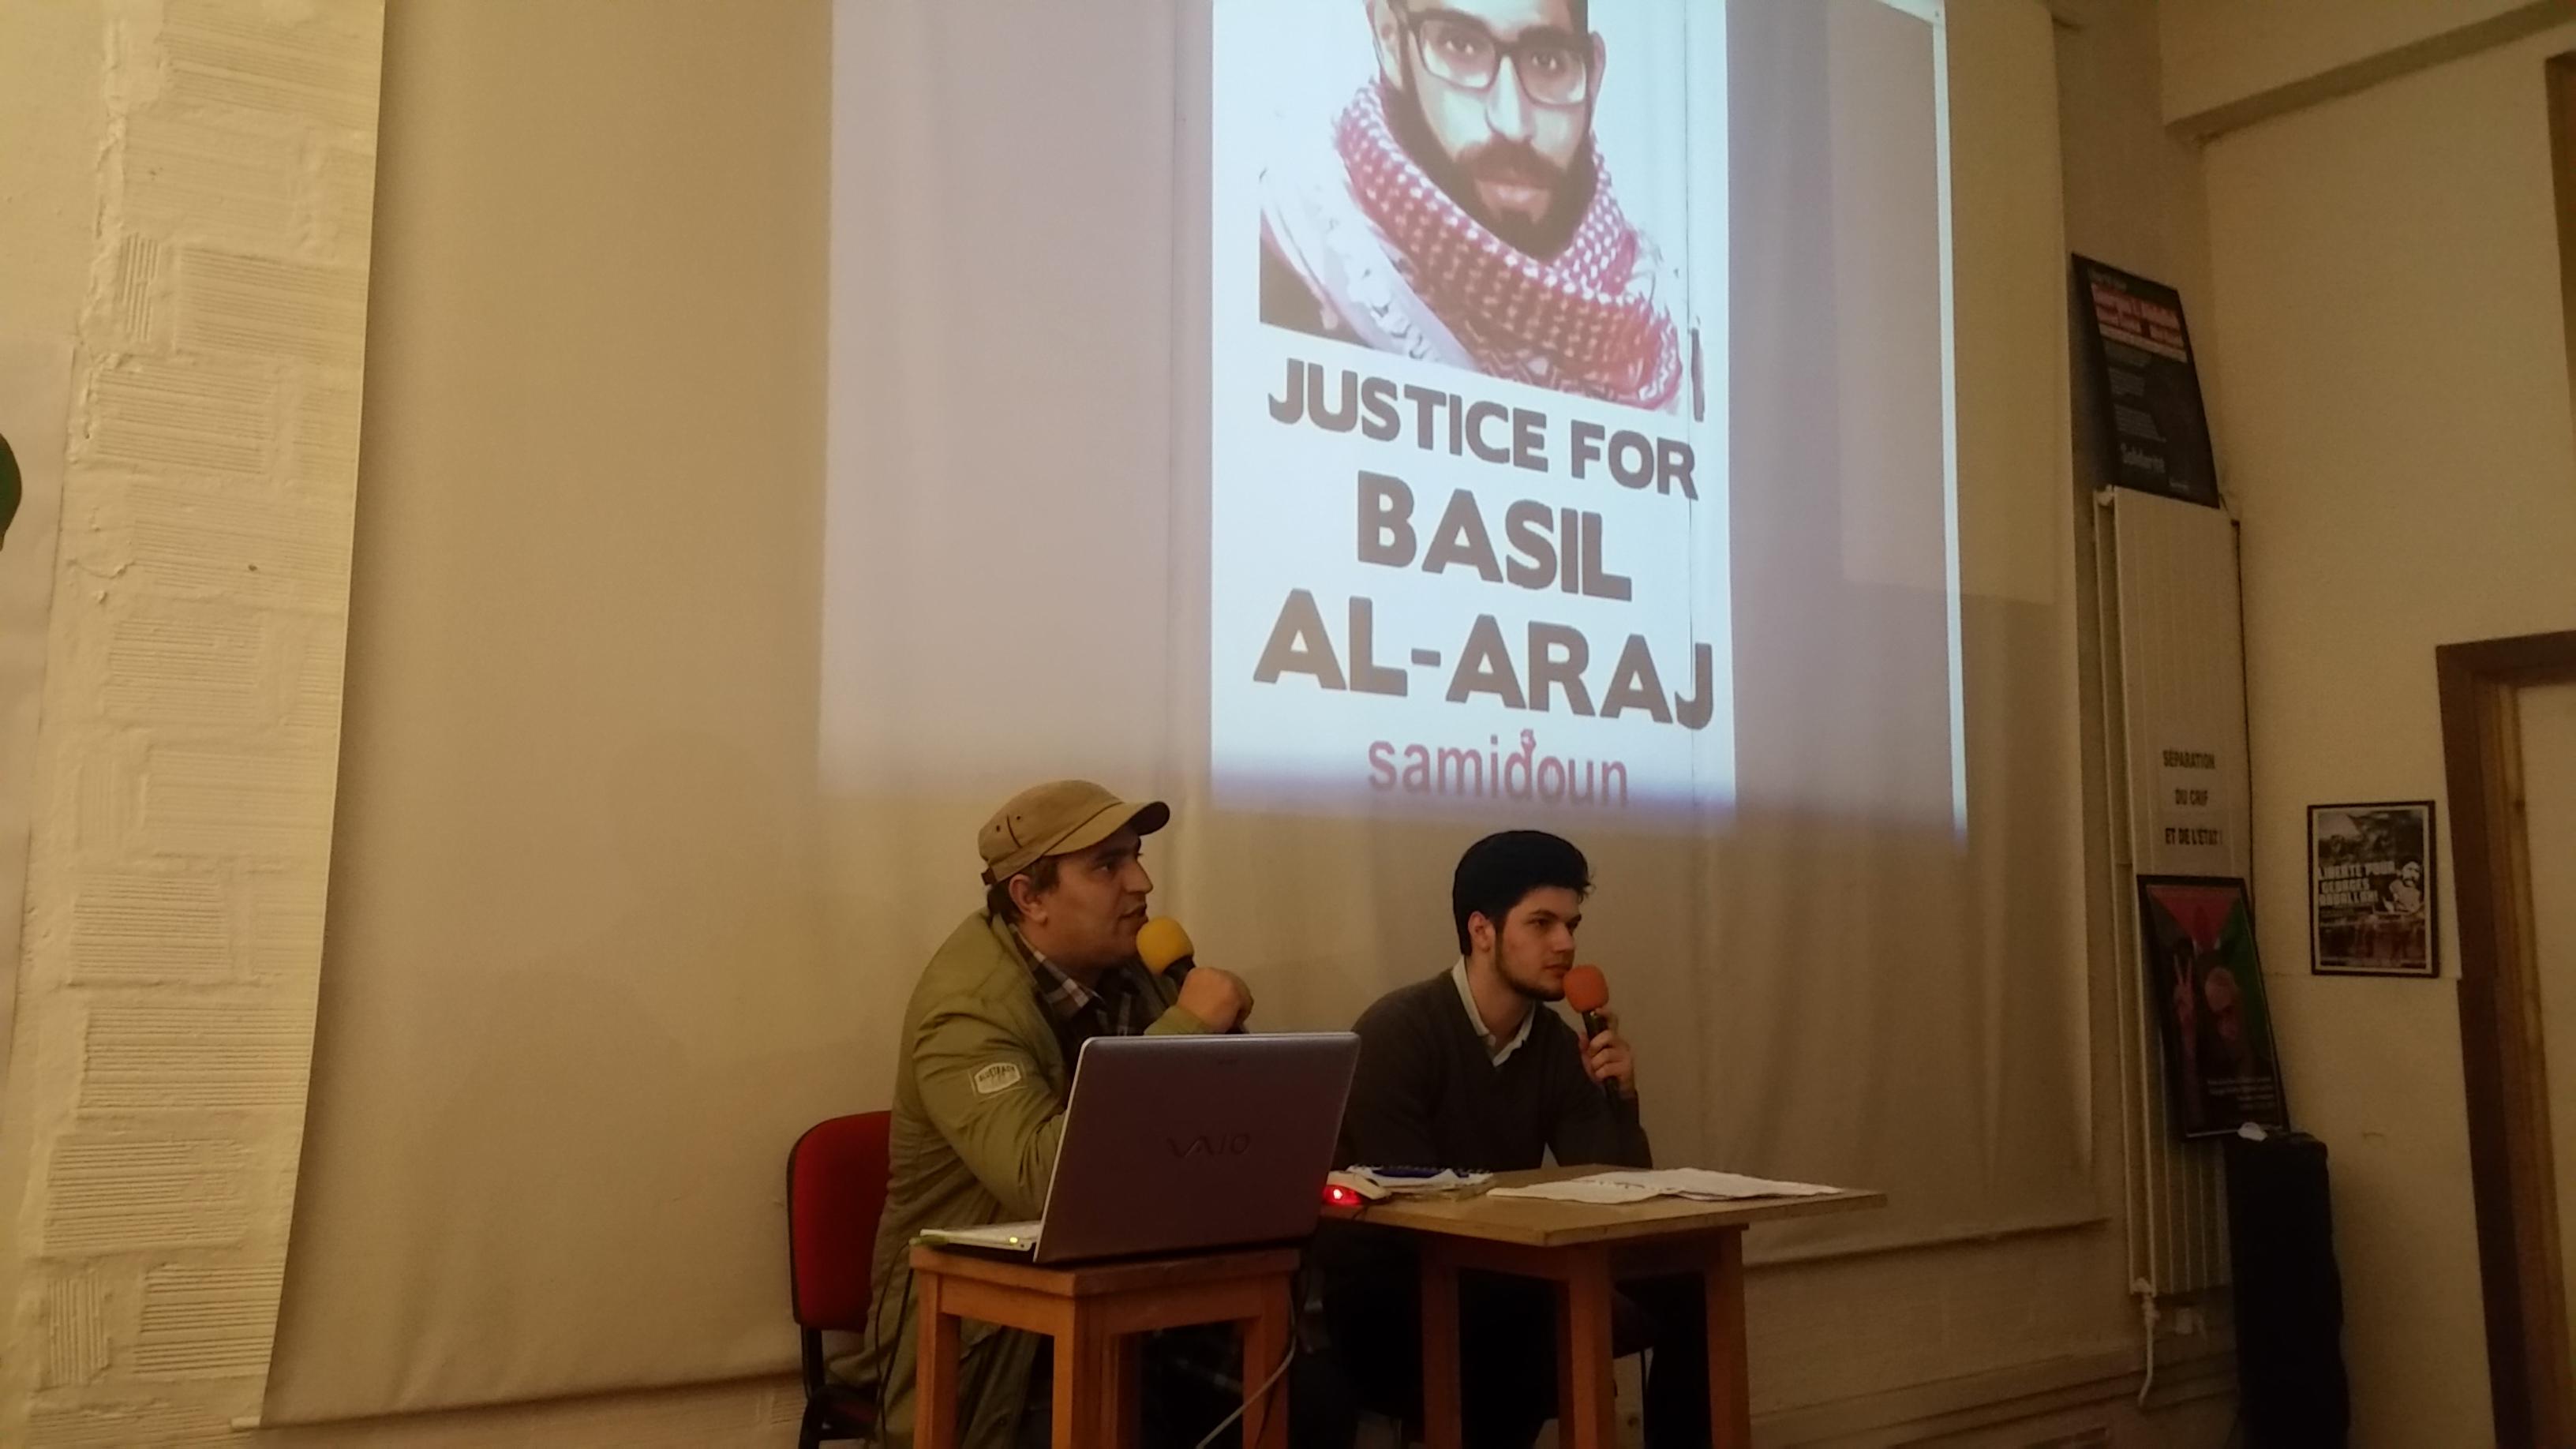 International | Campaign to Free Ahmad Sa'adat